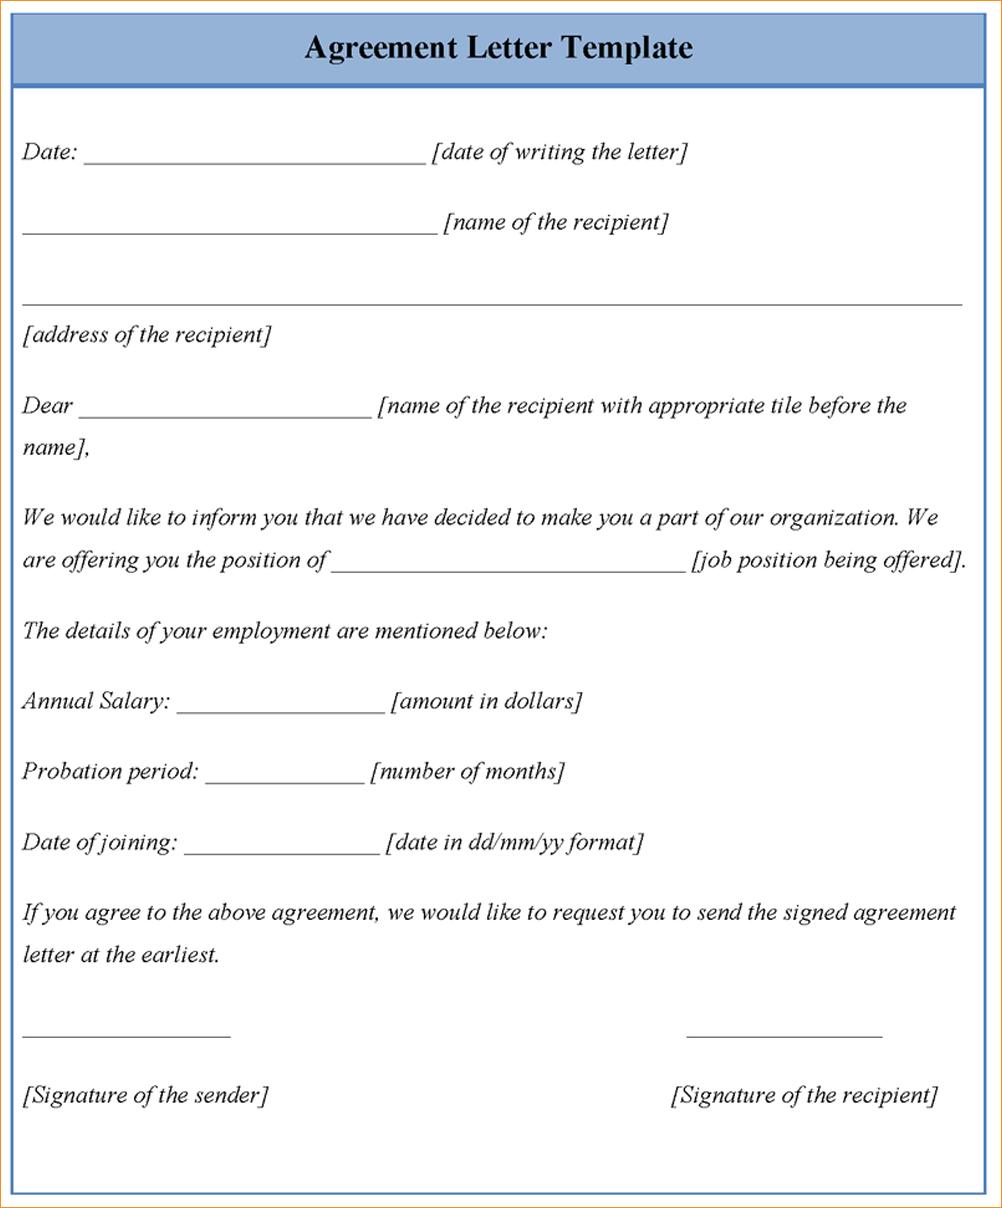 Business Letter Template Business letter template